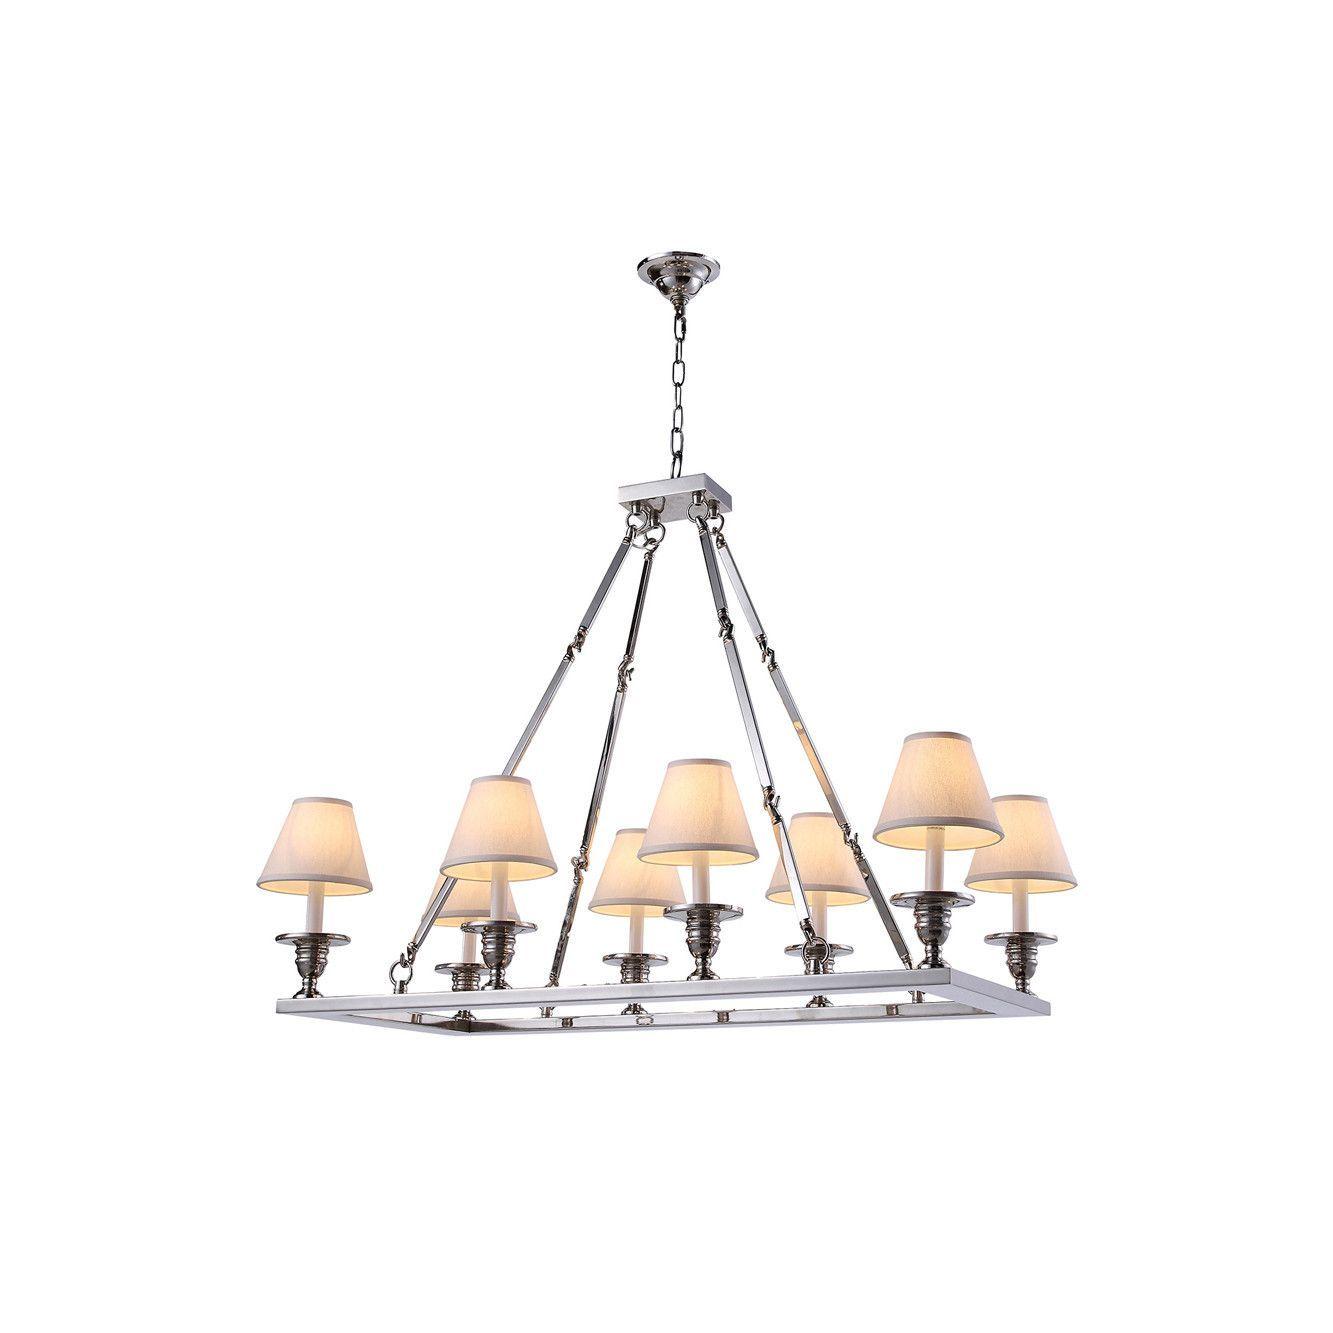 "Elegant Lighting 1403G38PN Franklin Collection Pendant Lamp L:38"""" W:19"""" H:33"""" Polished Nickel Finish"